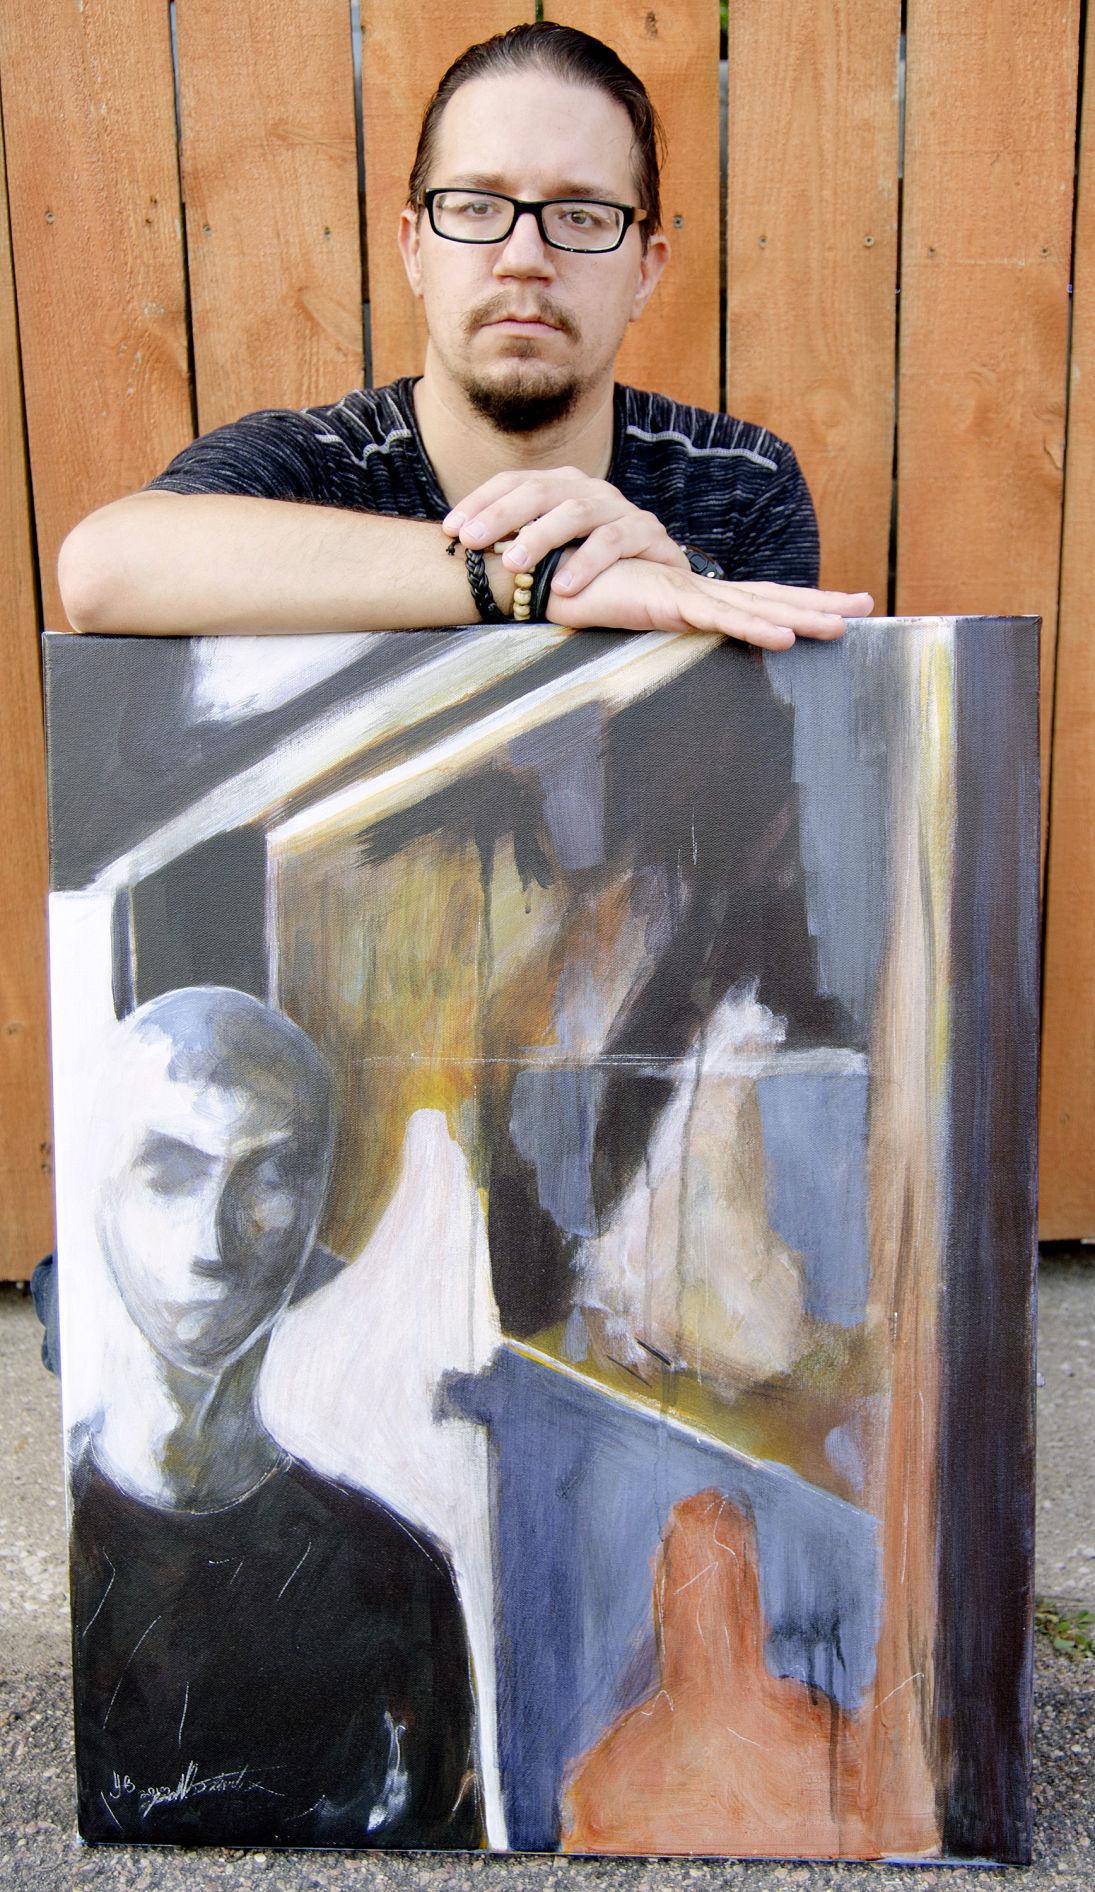 Josh Beckwith showcases his art